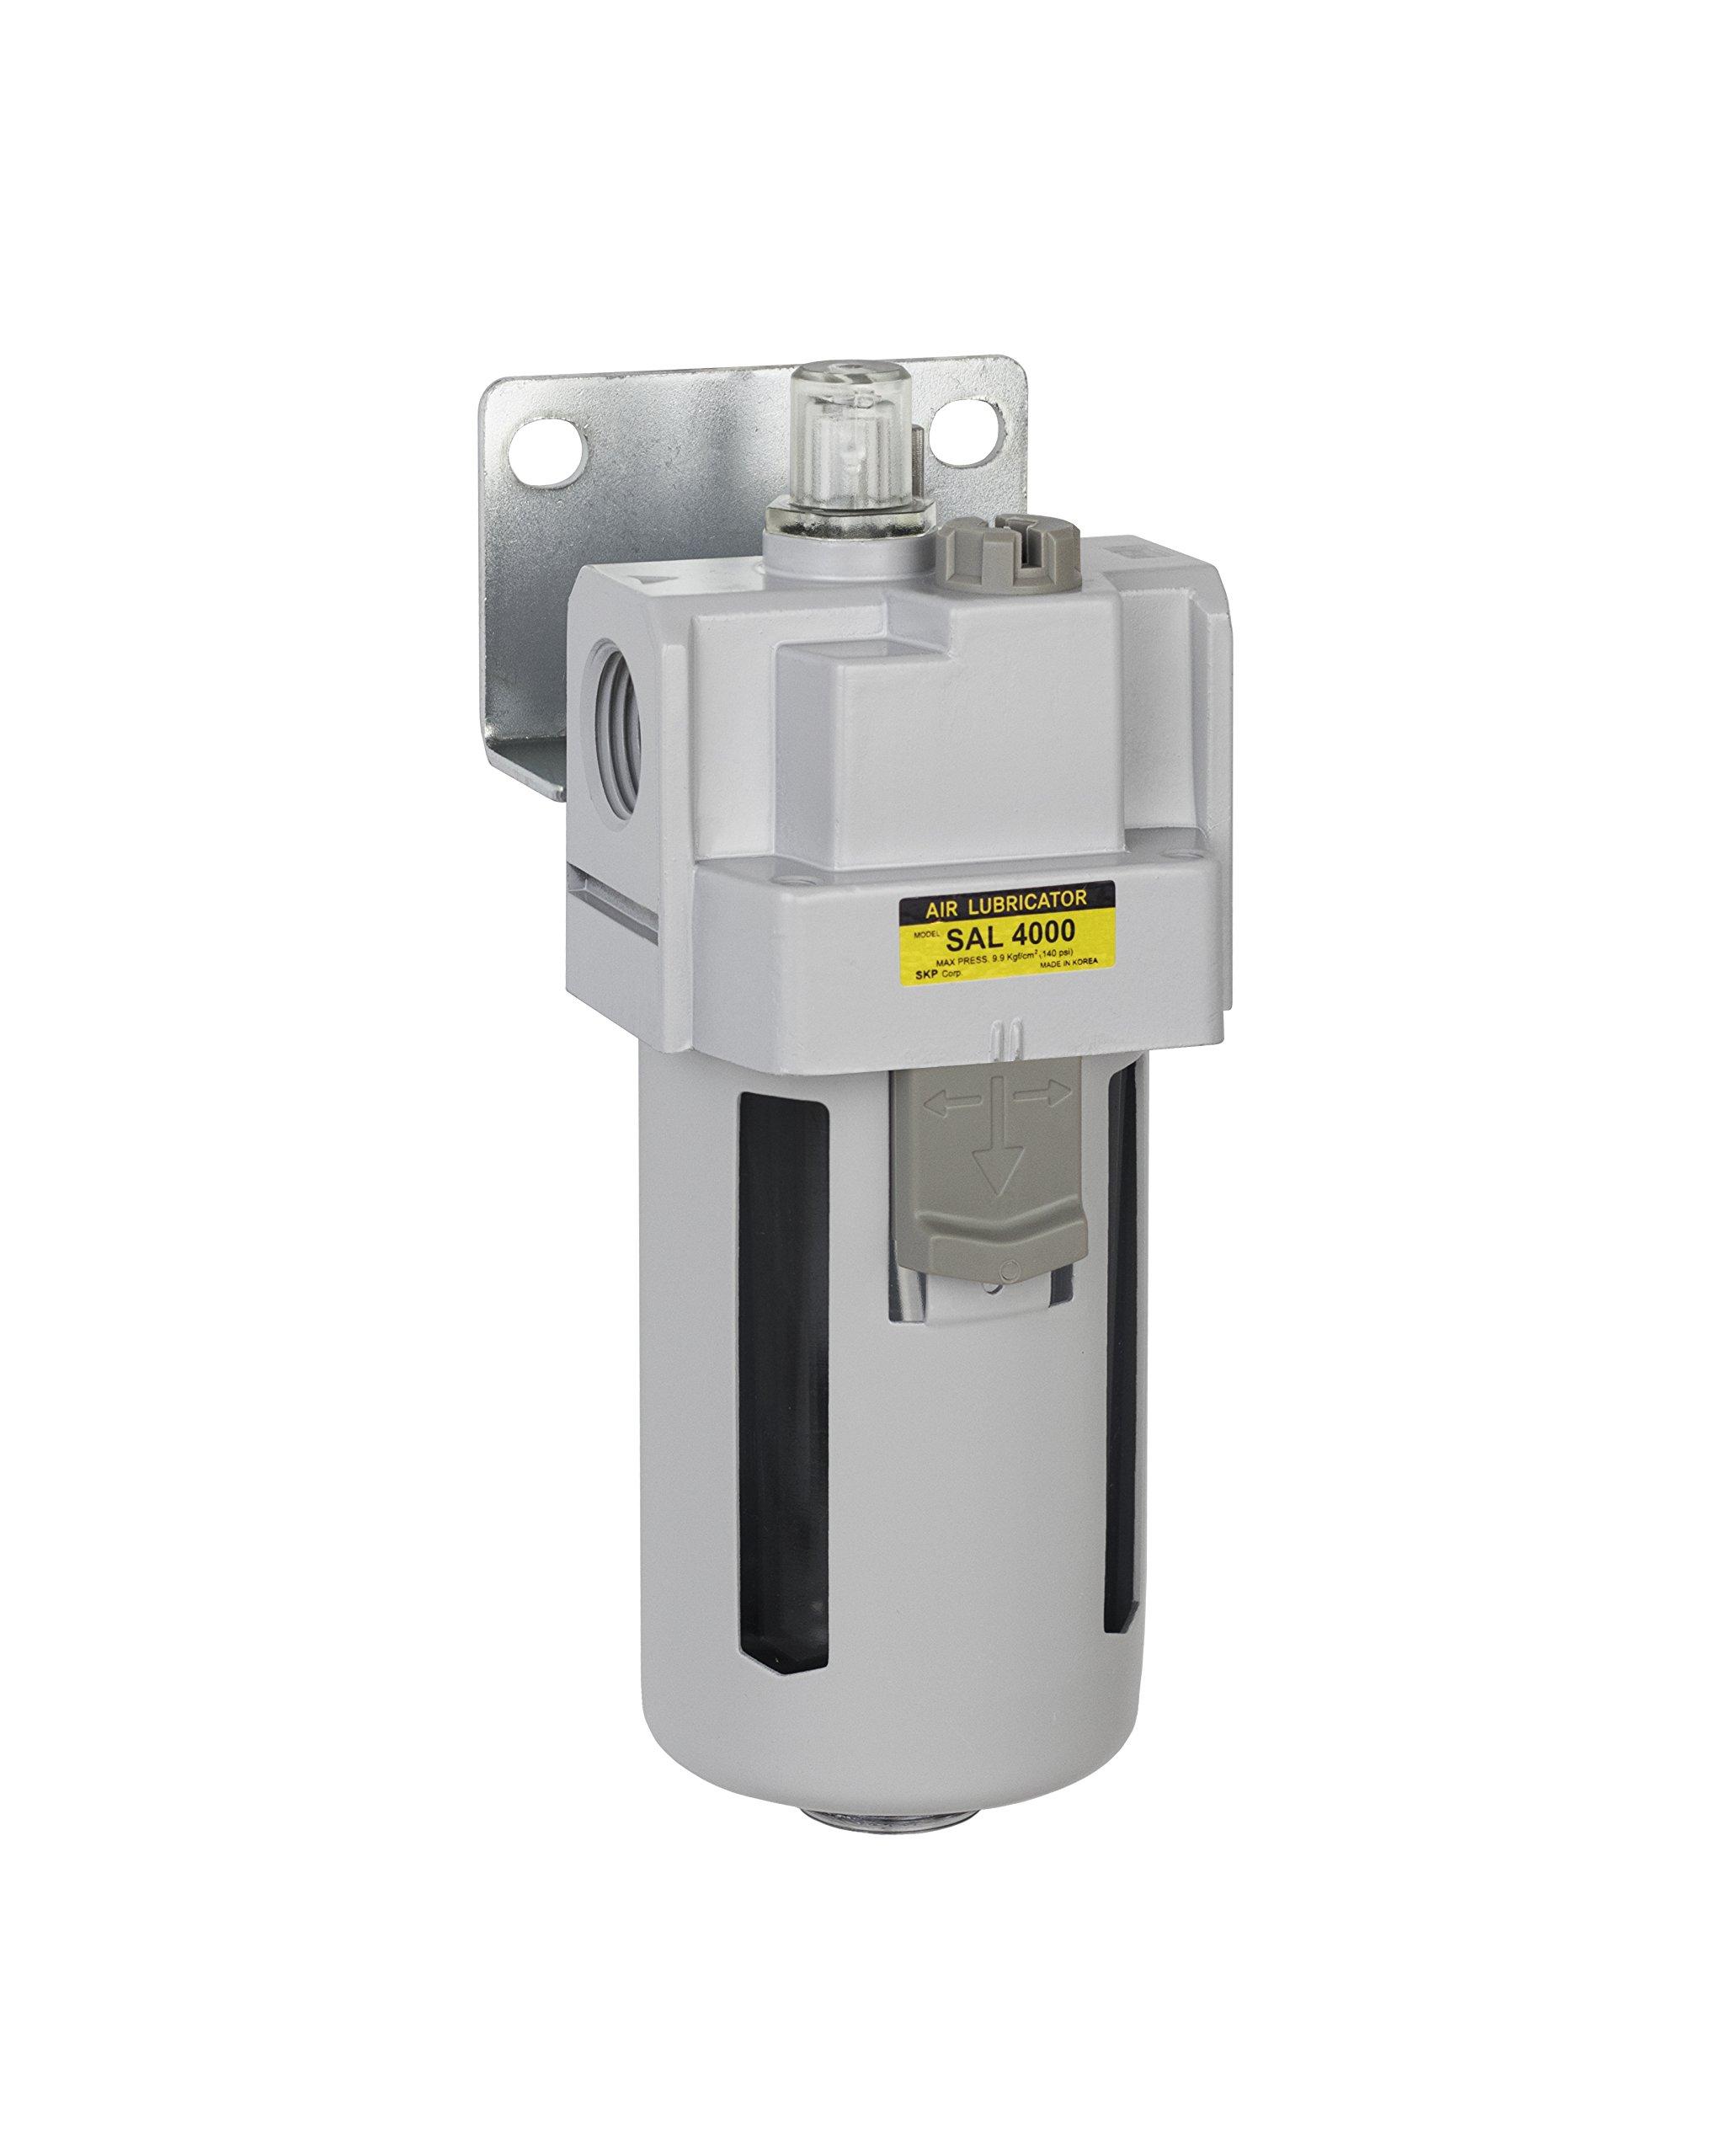 Bracket Poly Bowl PneumaticPlus SAL2000M-N02B Miniature Compressed Air Lubricator 1//4 NPT